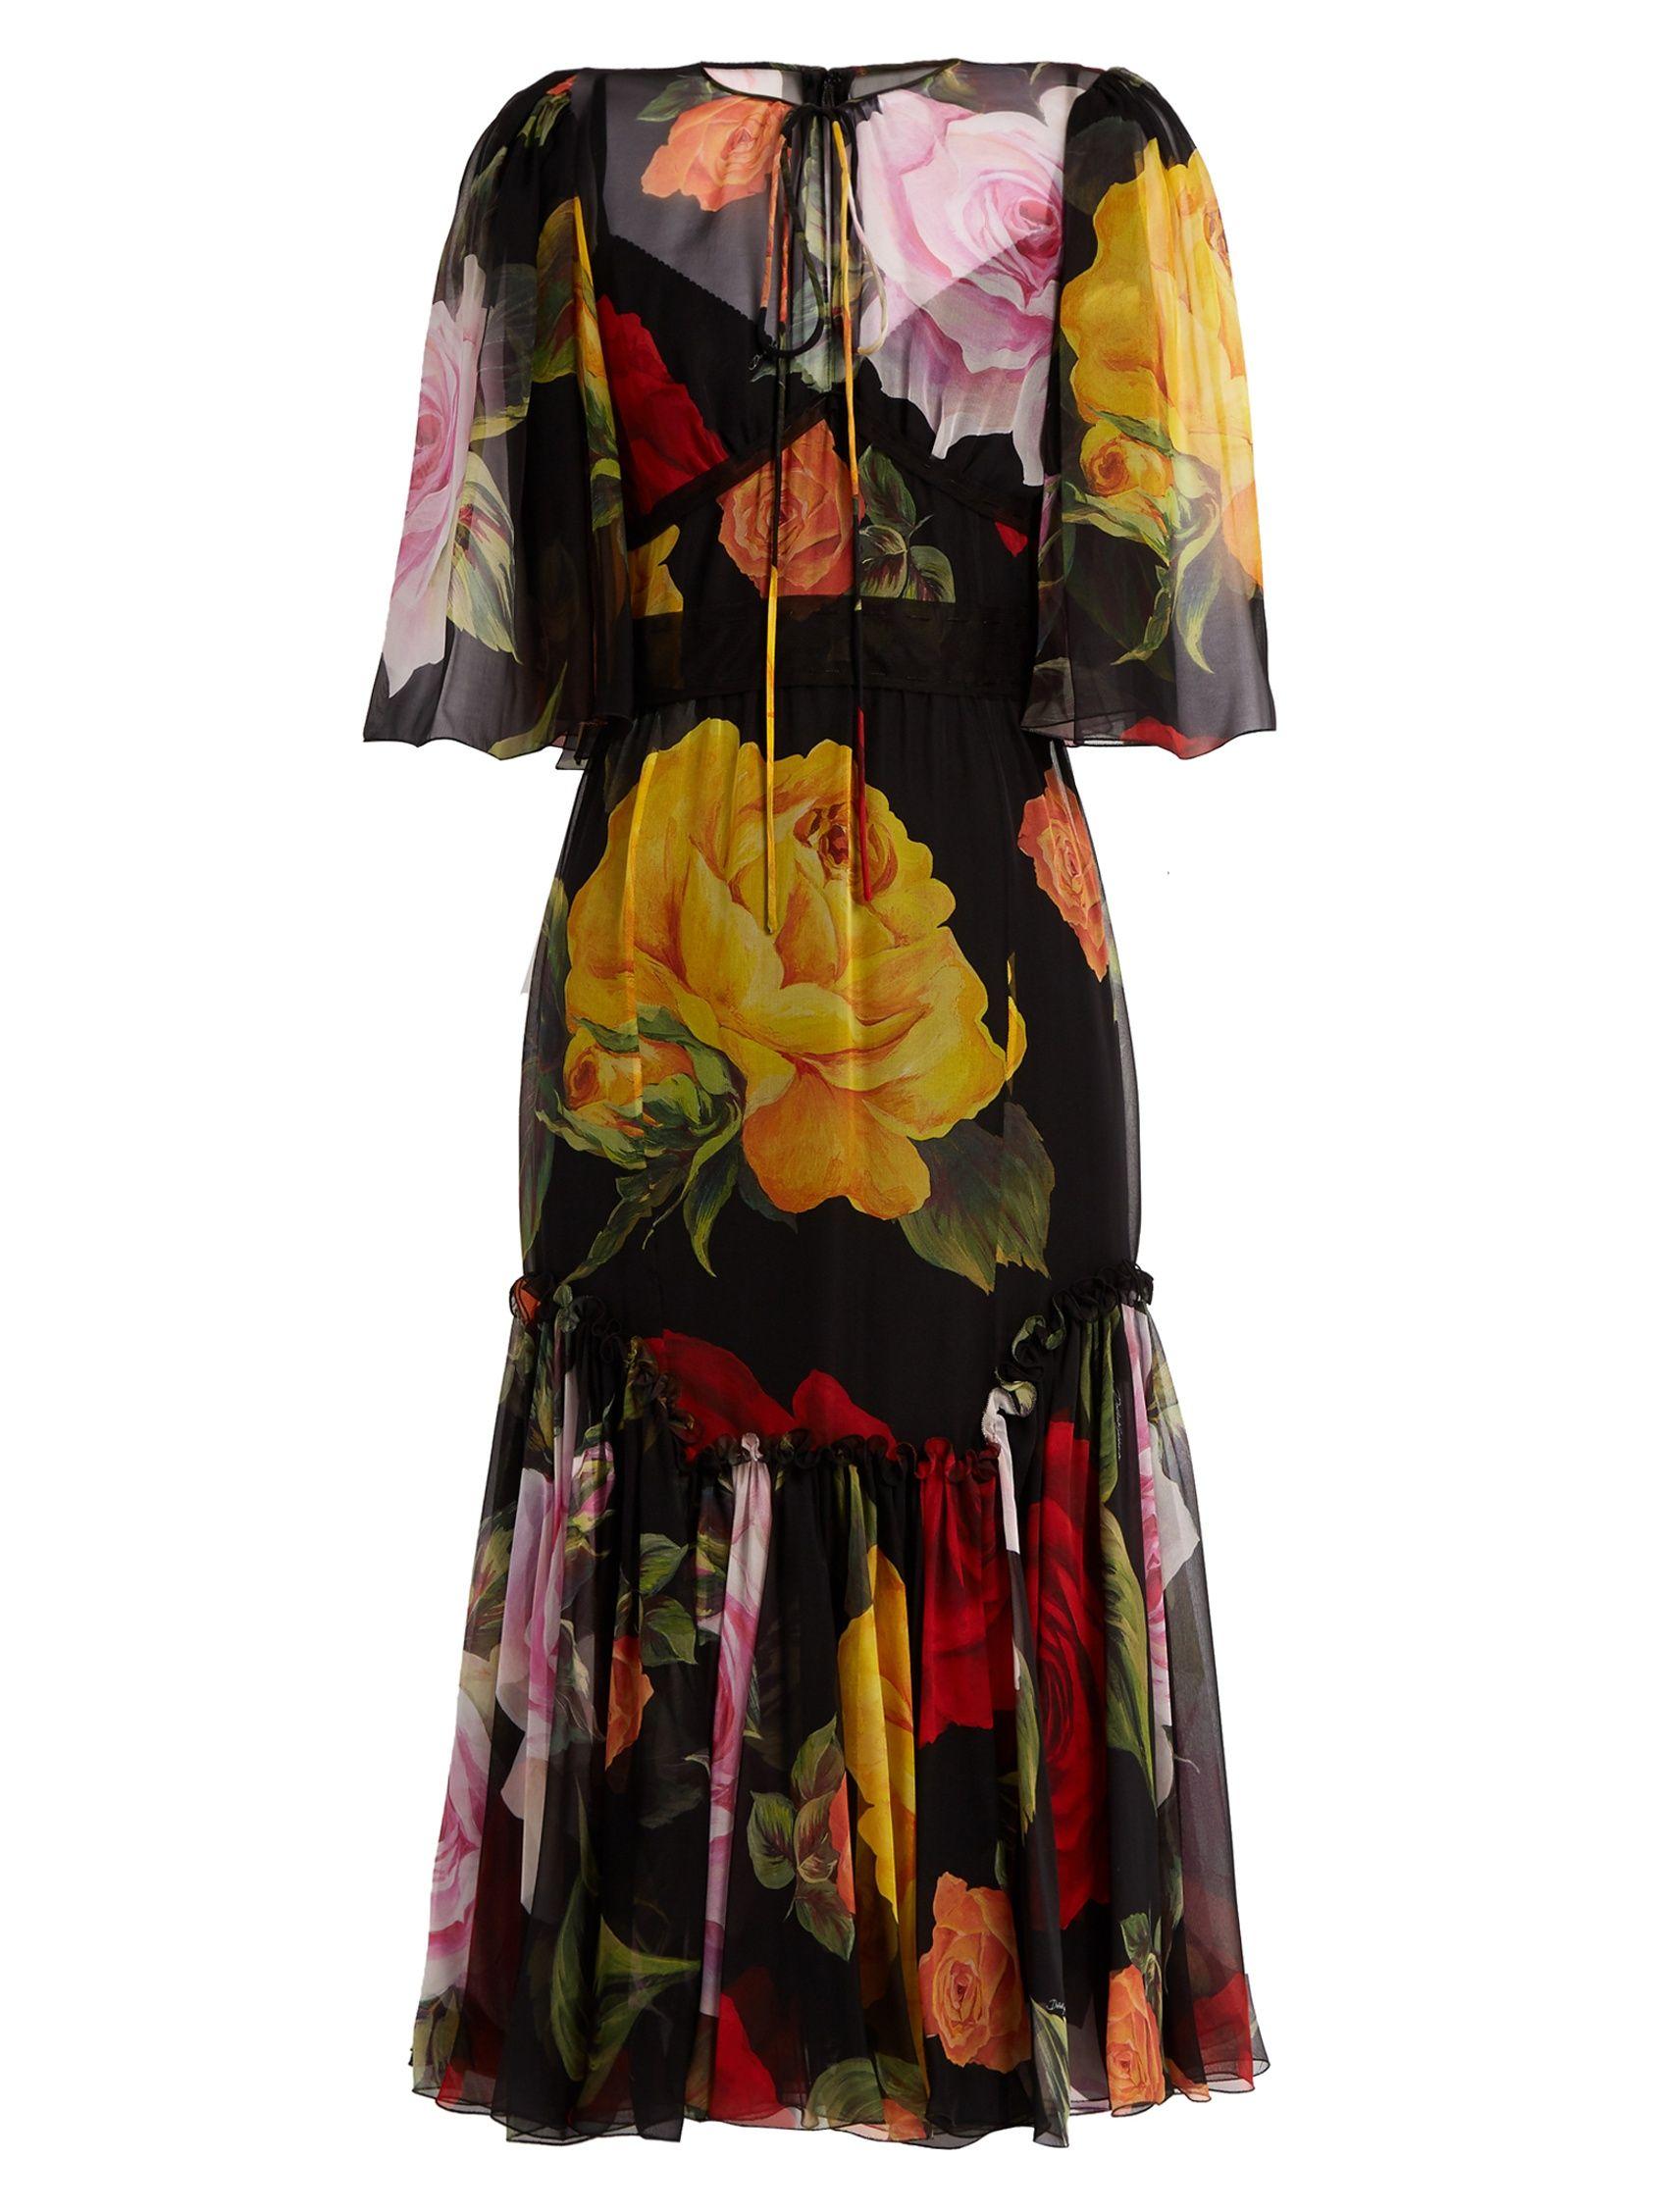 Dolce & Gabbana Woman Floral-print Silk-chiffon Midi Dress Black Size 36 Dolce & Gabbana 6t7MVYmc2U